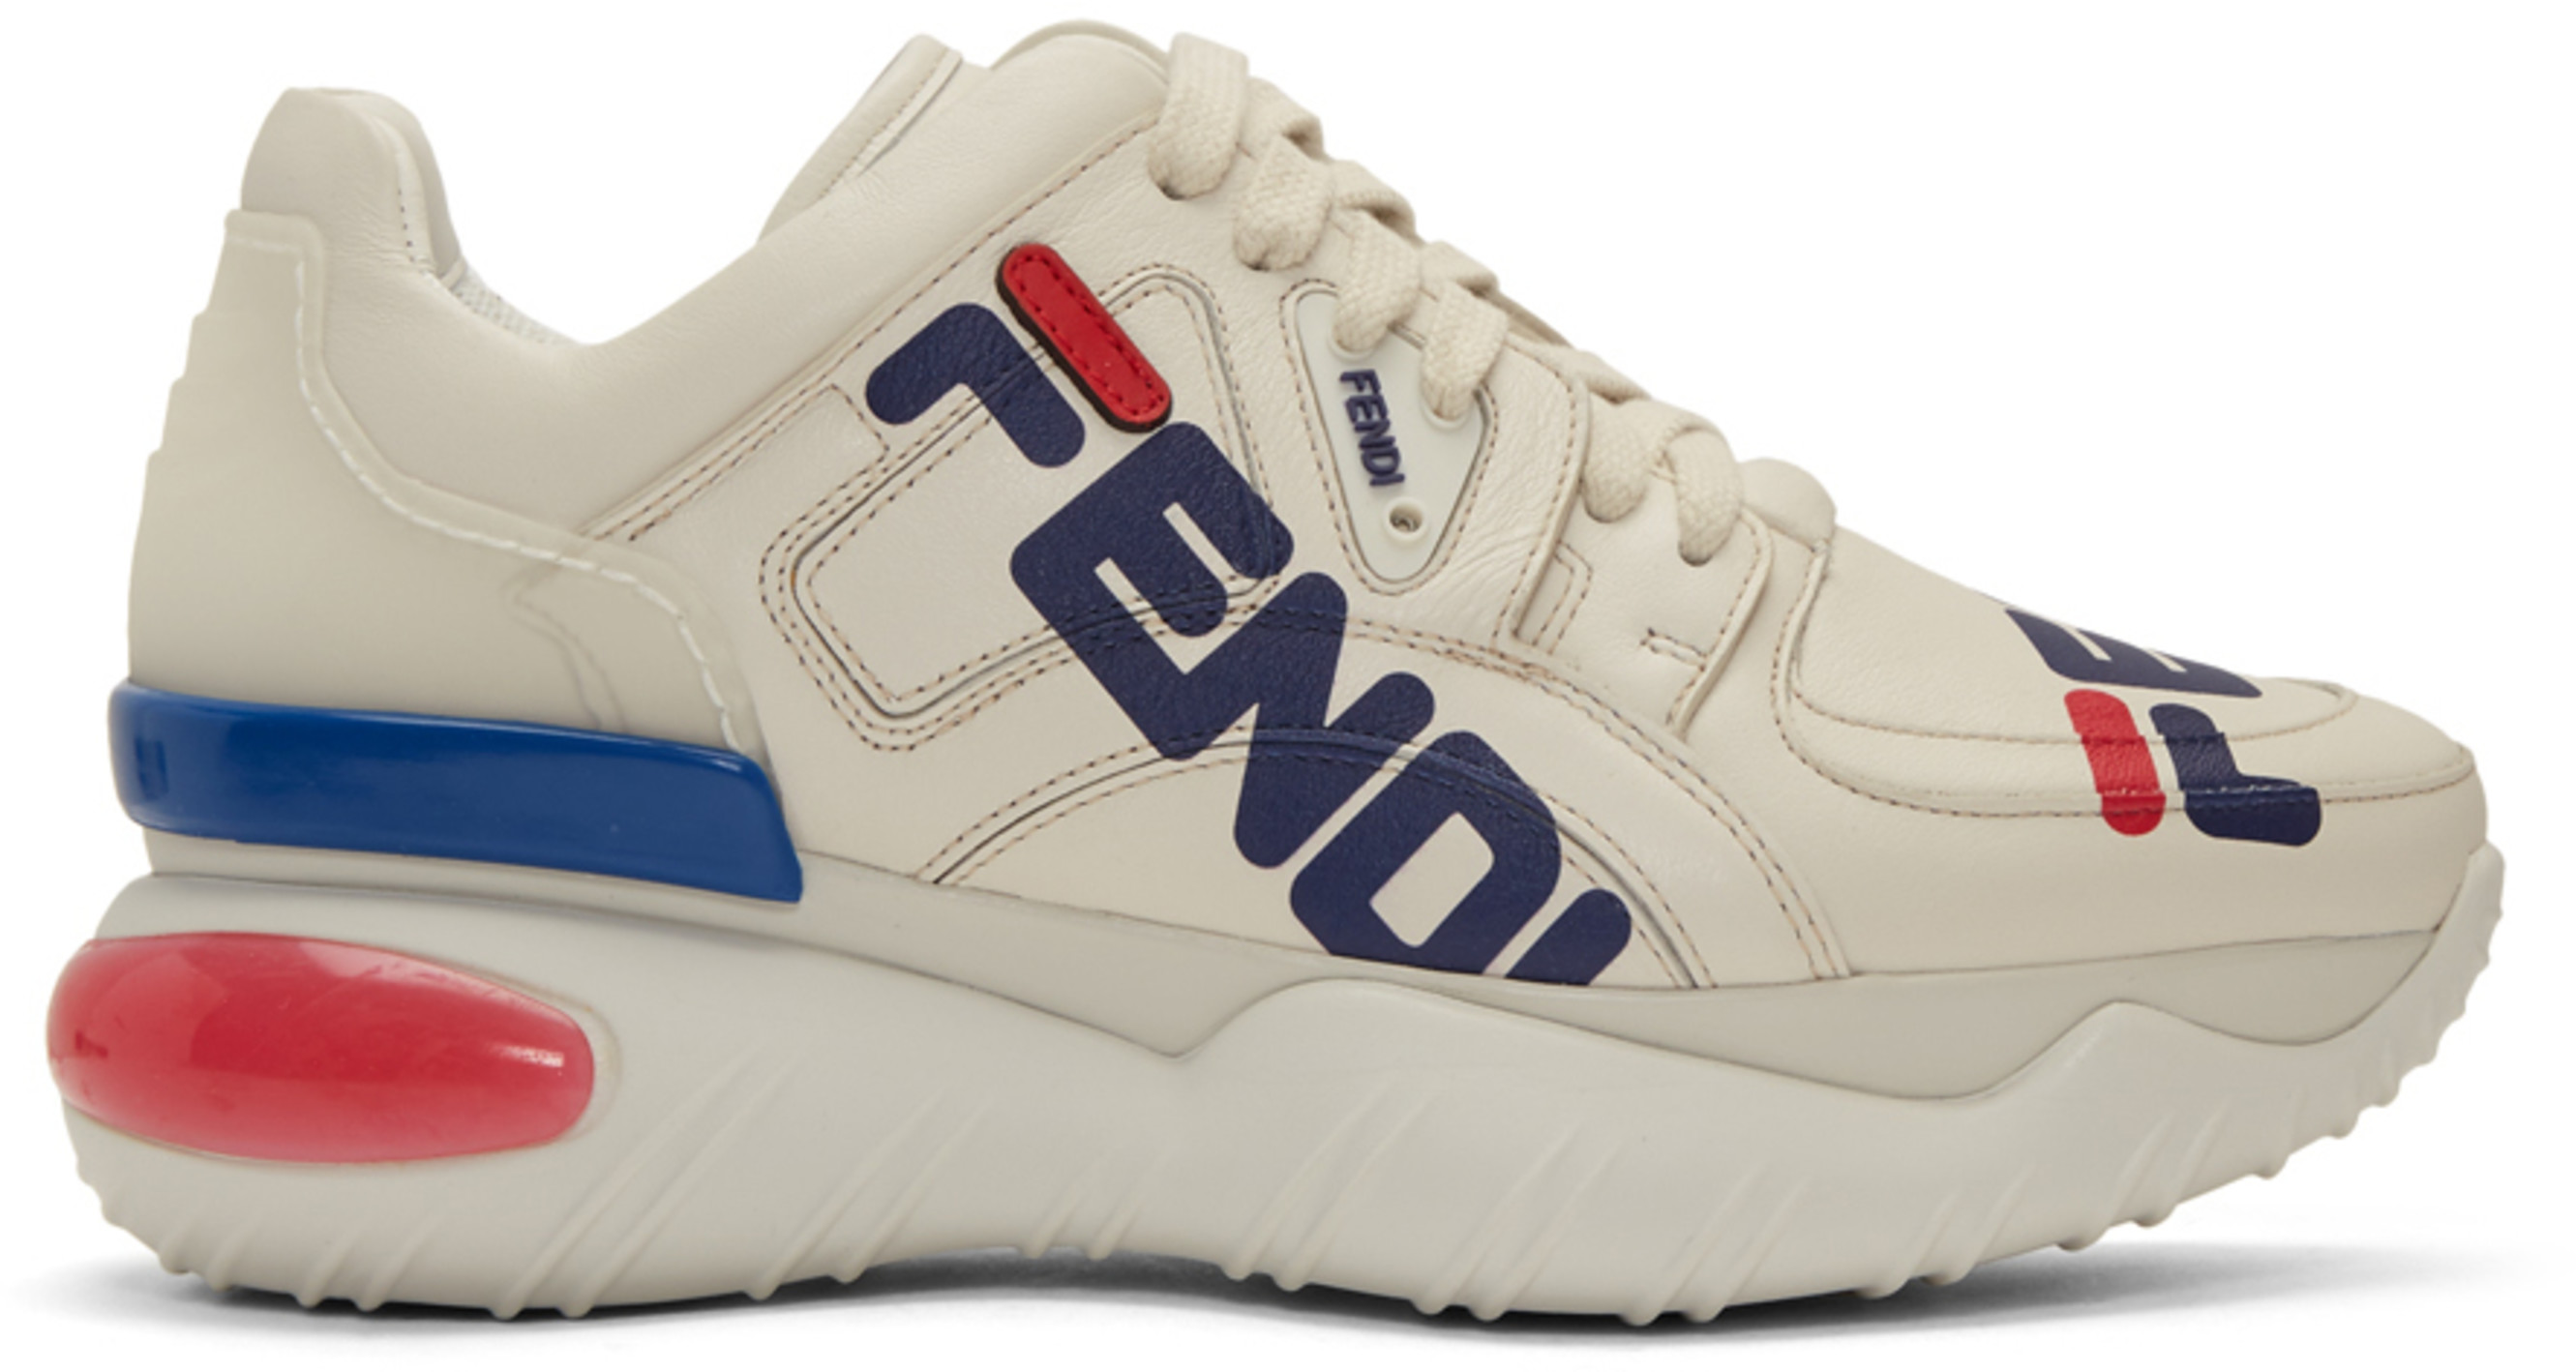 release date 69f26 ce082 White 'Fendi Mania' Chunky Sneakers